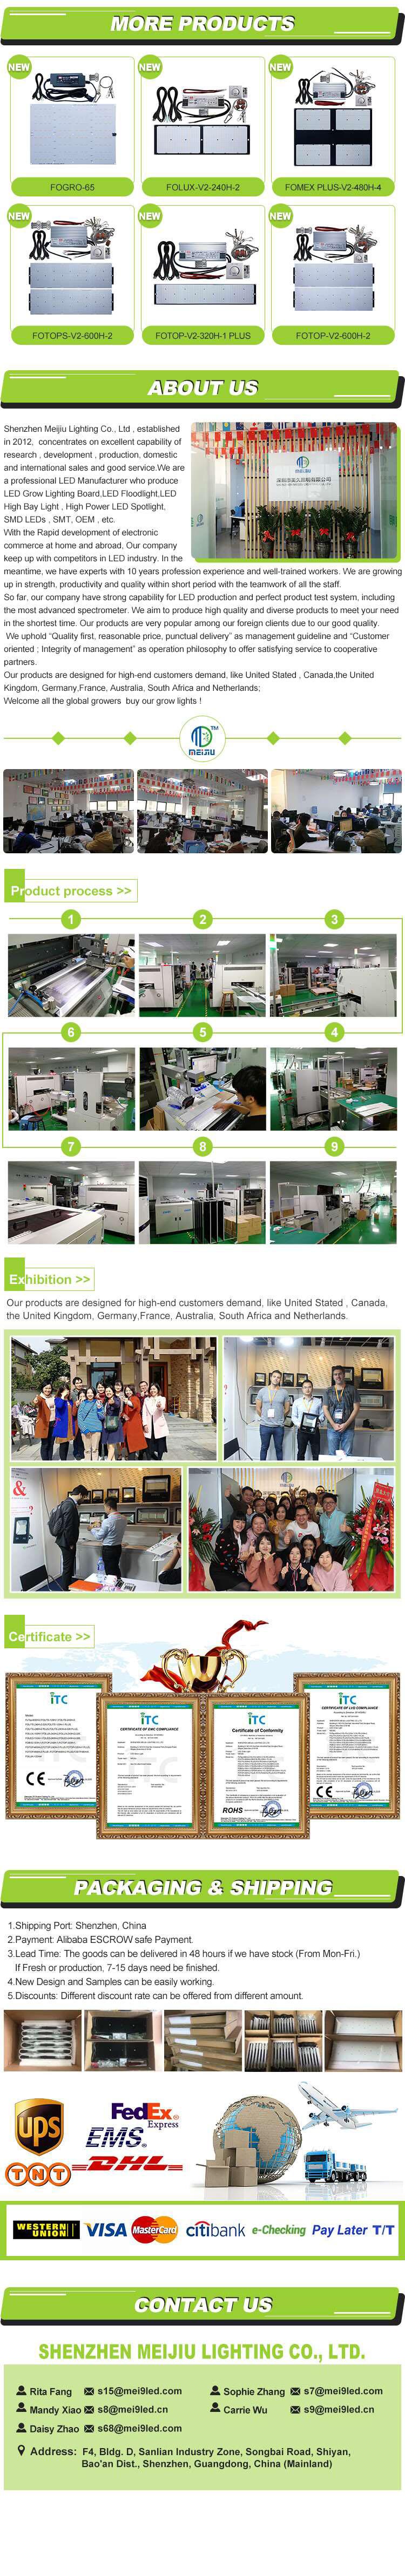 Free shipping Replace 600 w 1000w HPS HLG 600 QB quantum board samsung  lm301b v2 grow light for tent, View quantum board lm301b, Shenzhen Meijiu